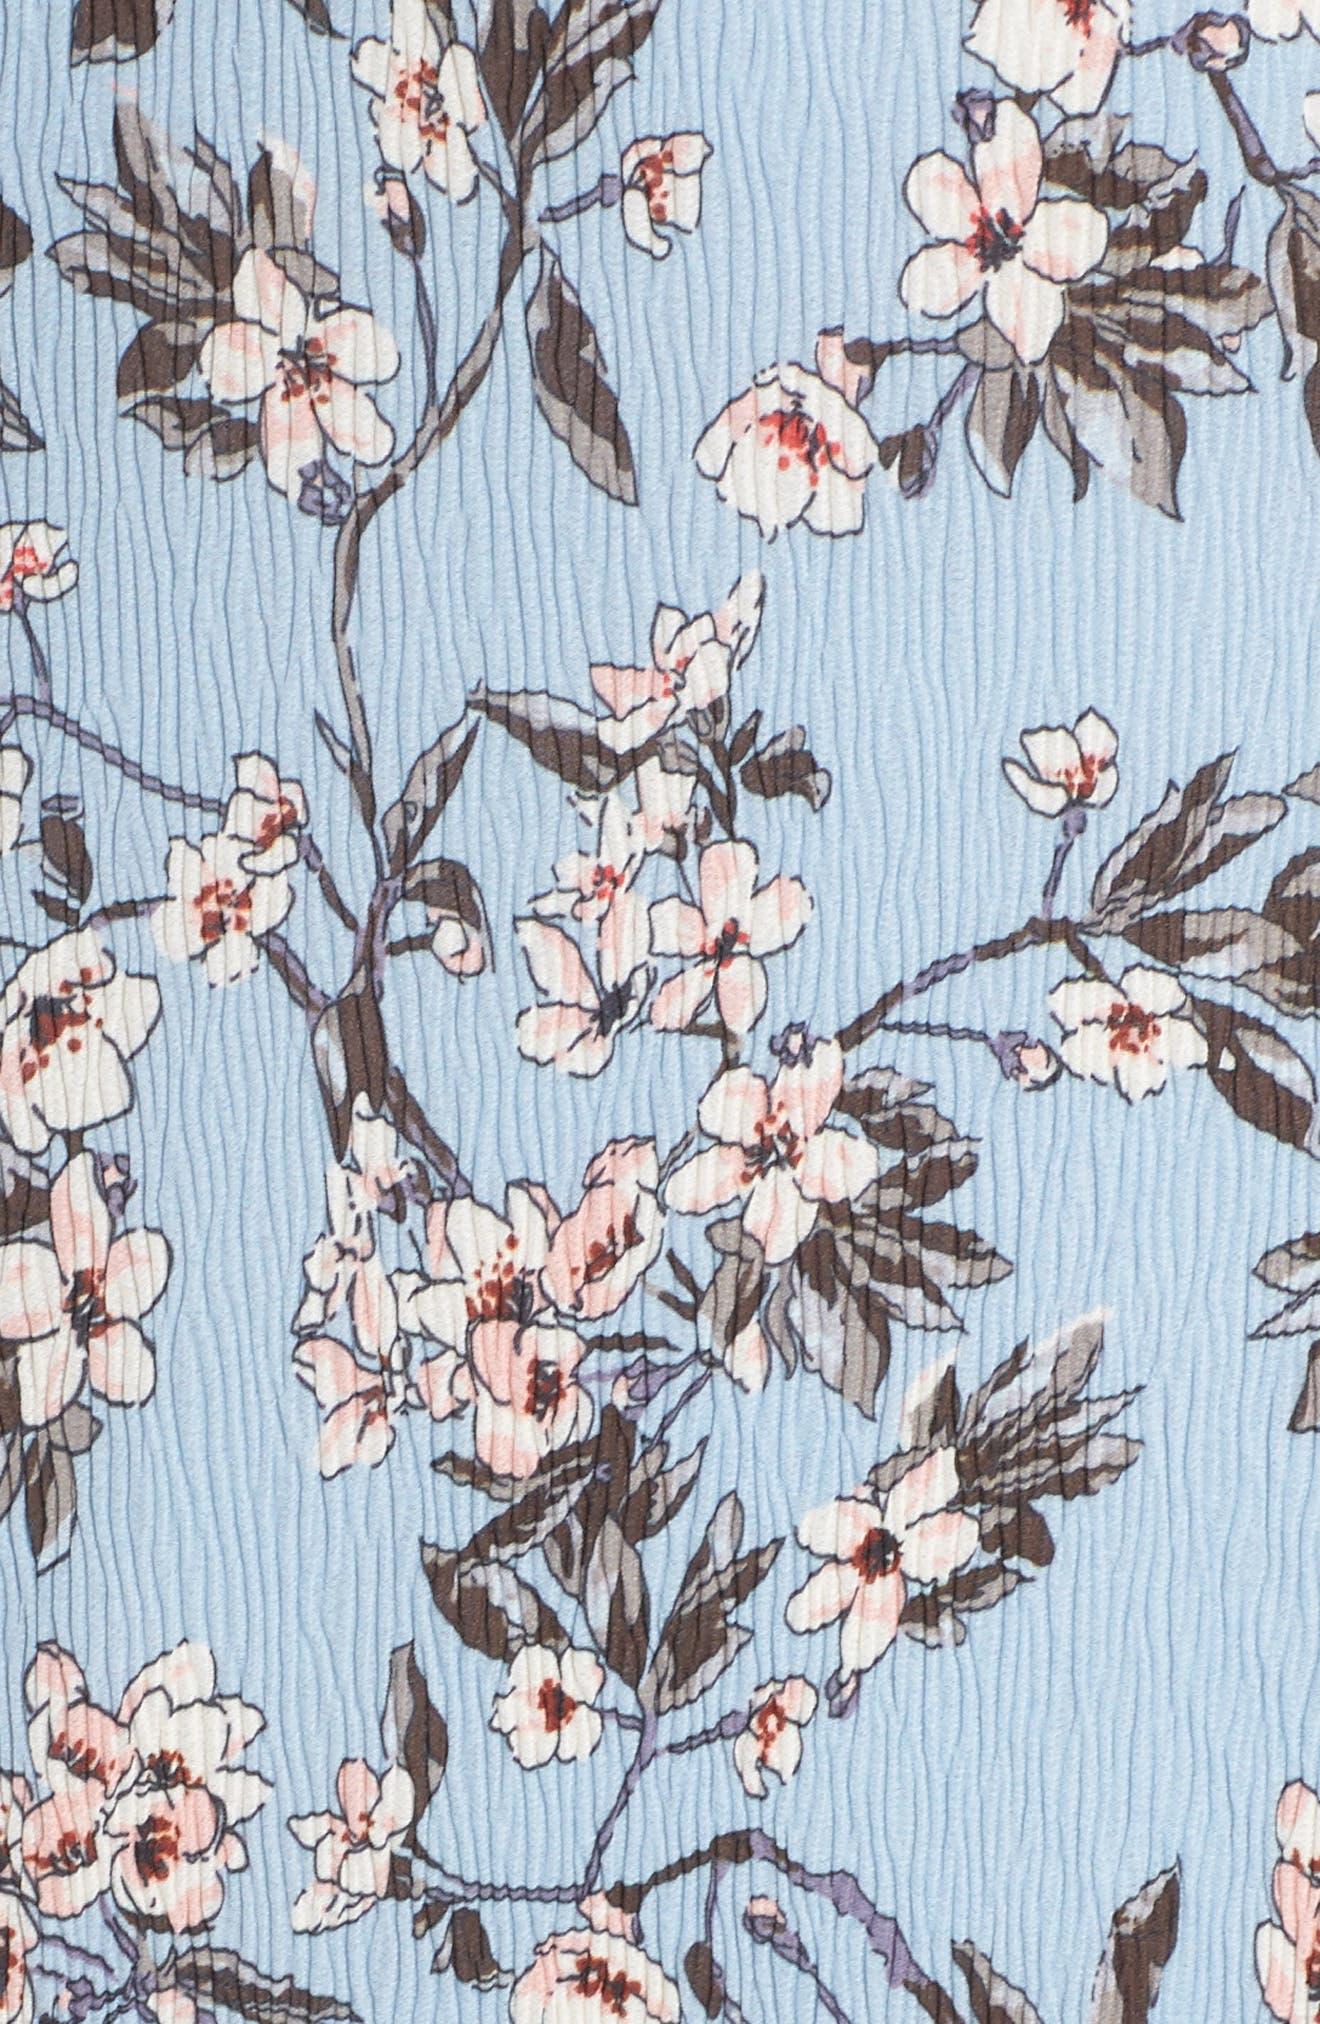 Floral Print High/Low Halter Dress,                             Alternate thumbnail 5, color,                             Blue Madison Floral